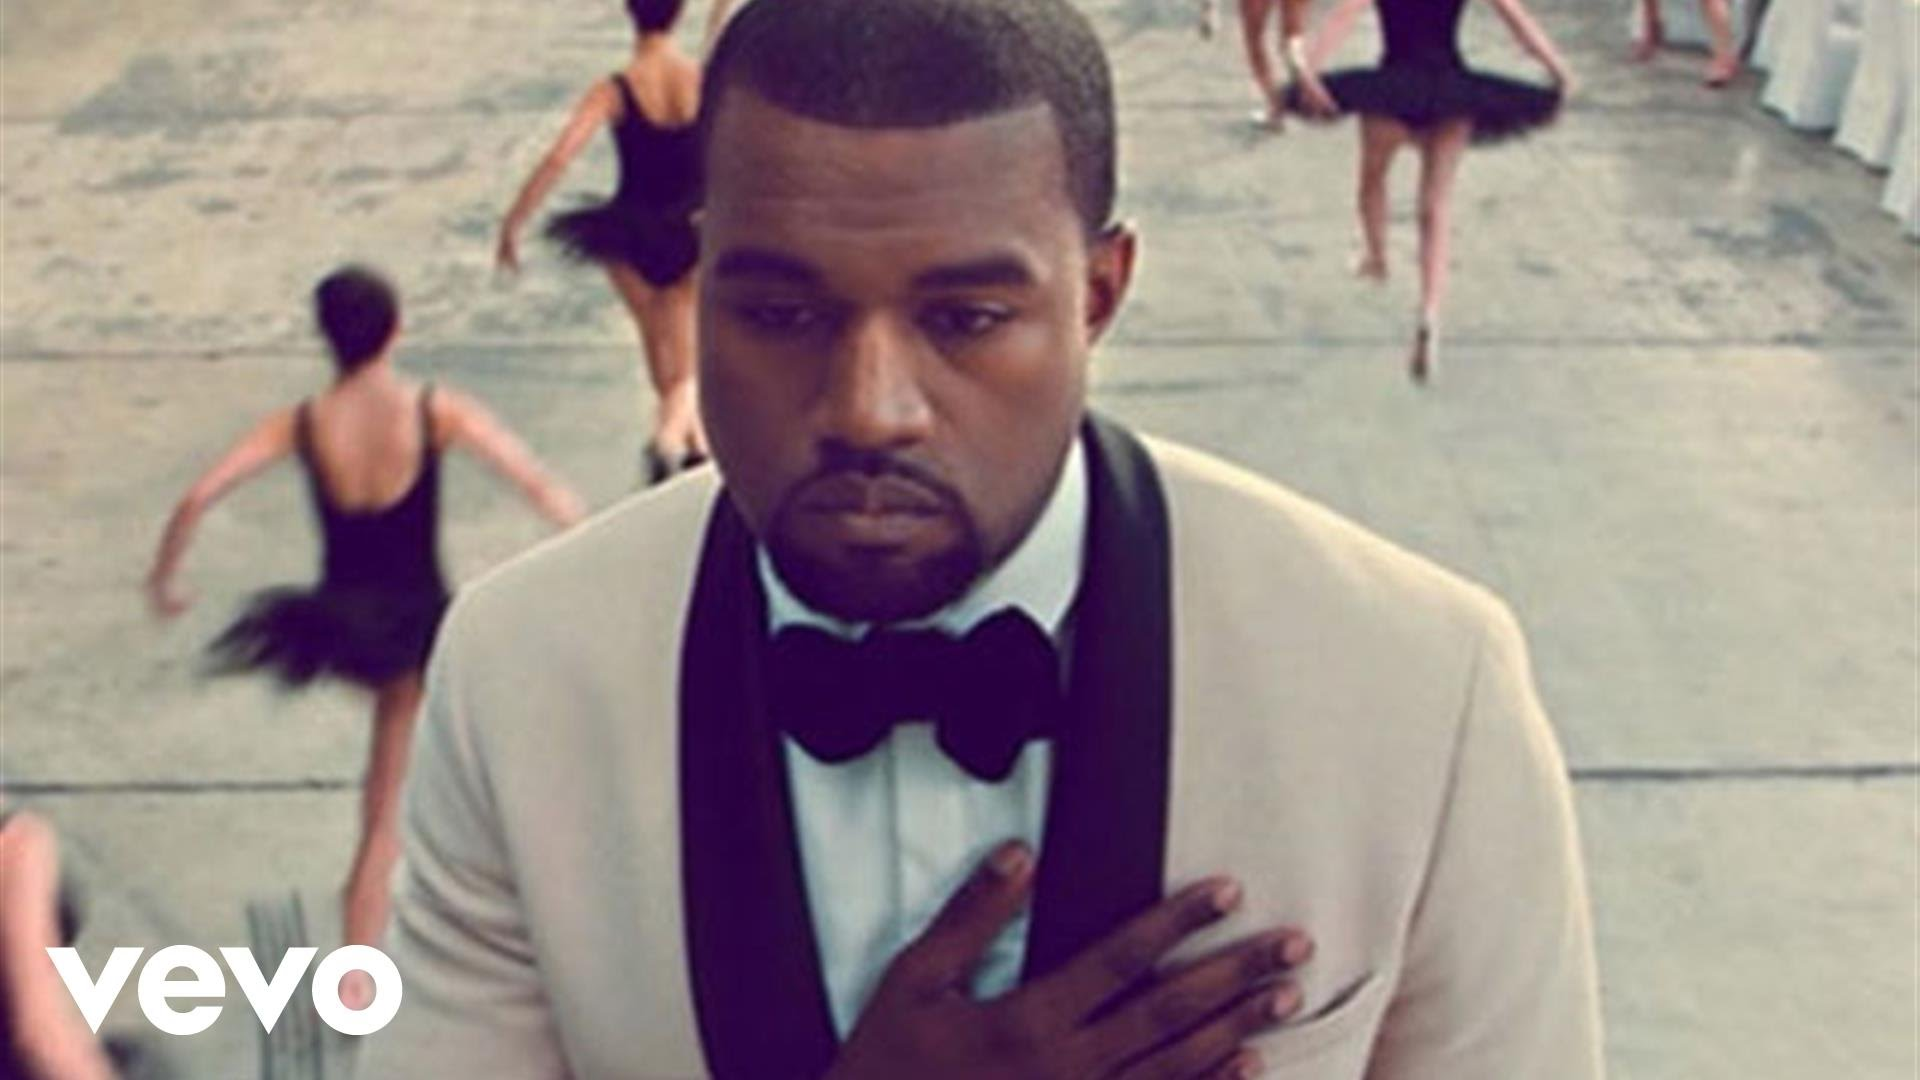 Kanye West interviews designer Axel Vervoordt, says he's working on a philosophy book